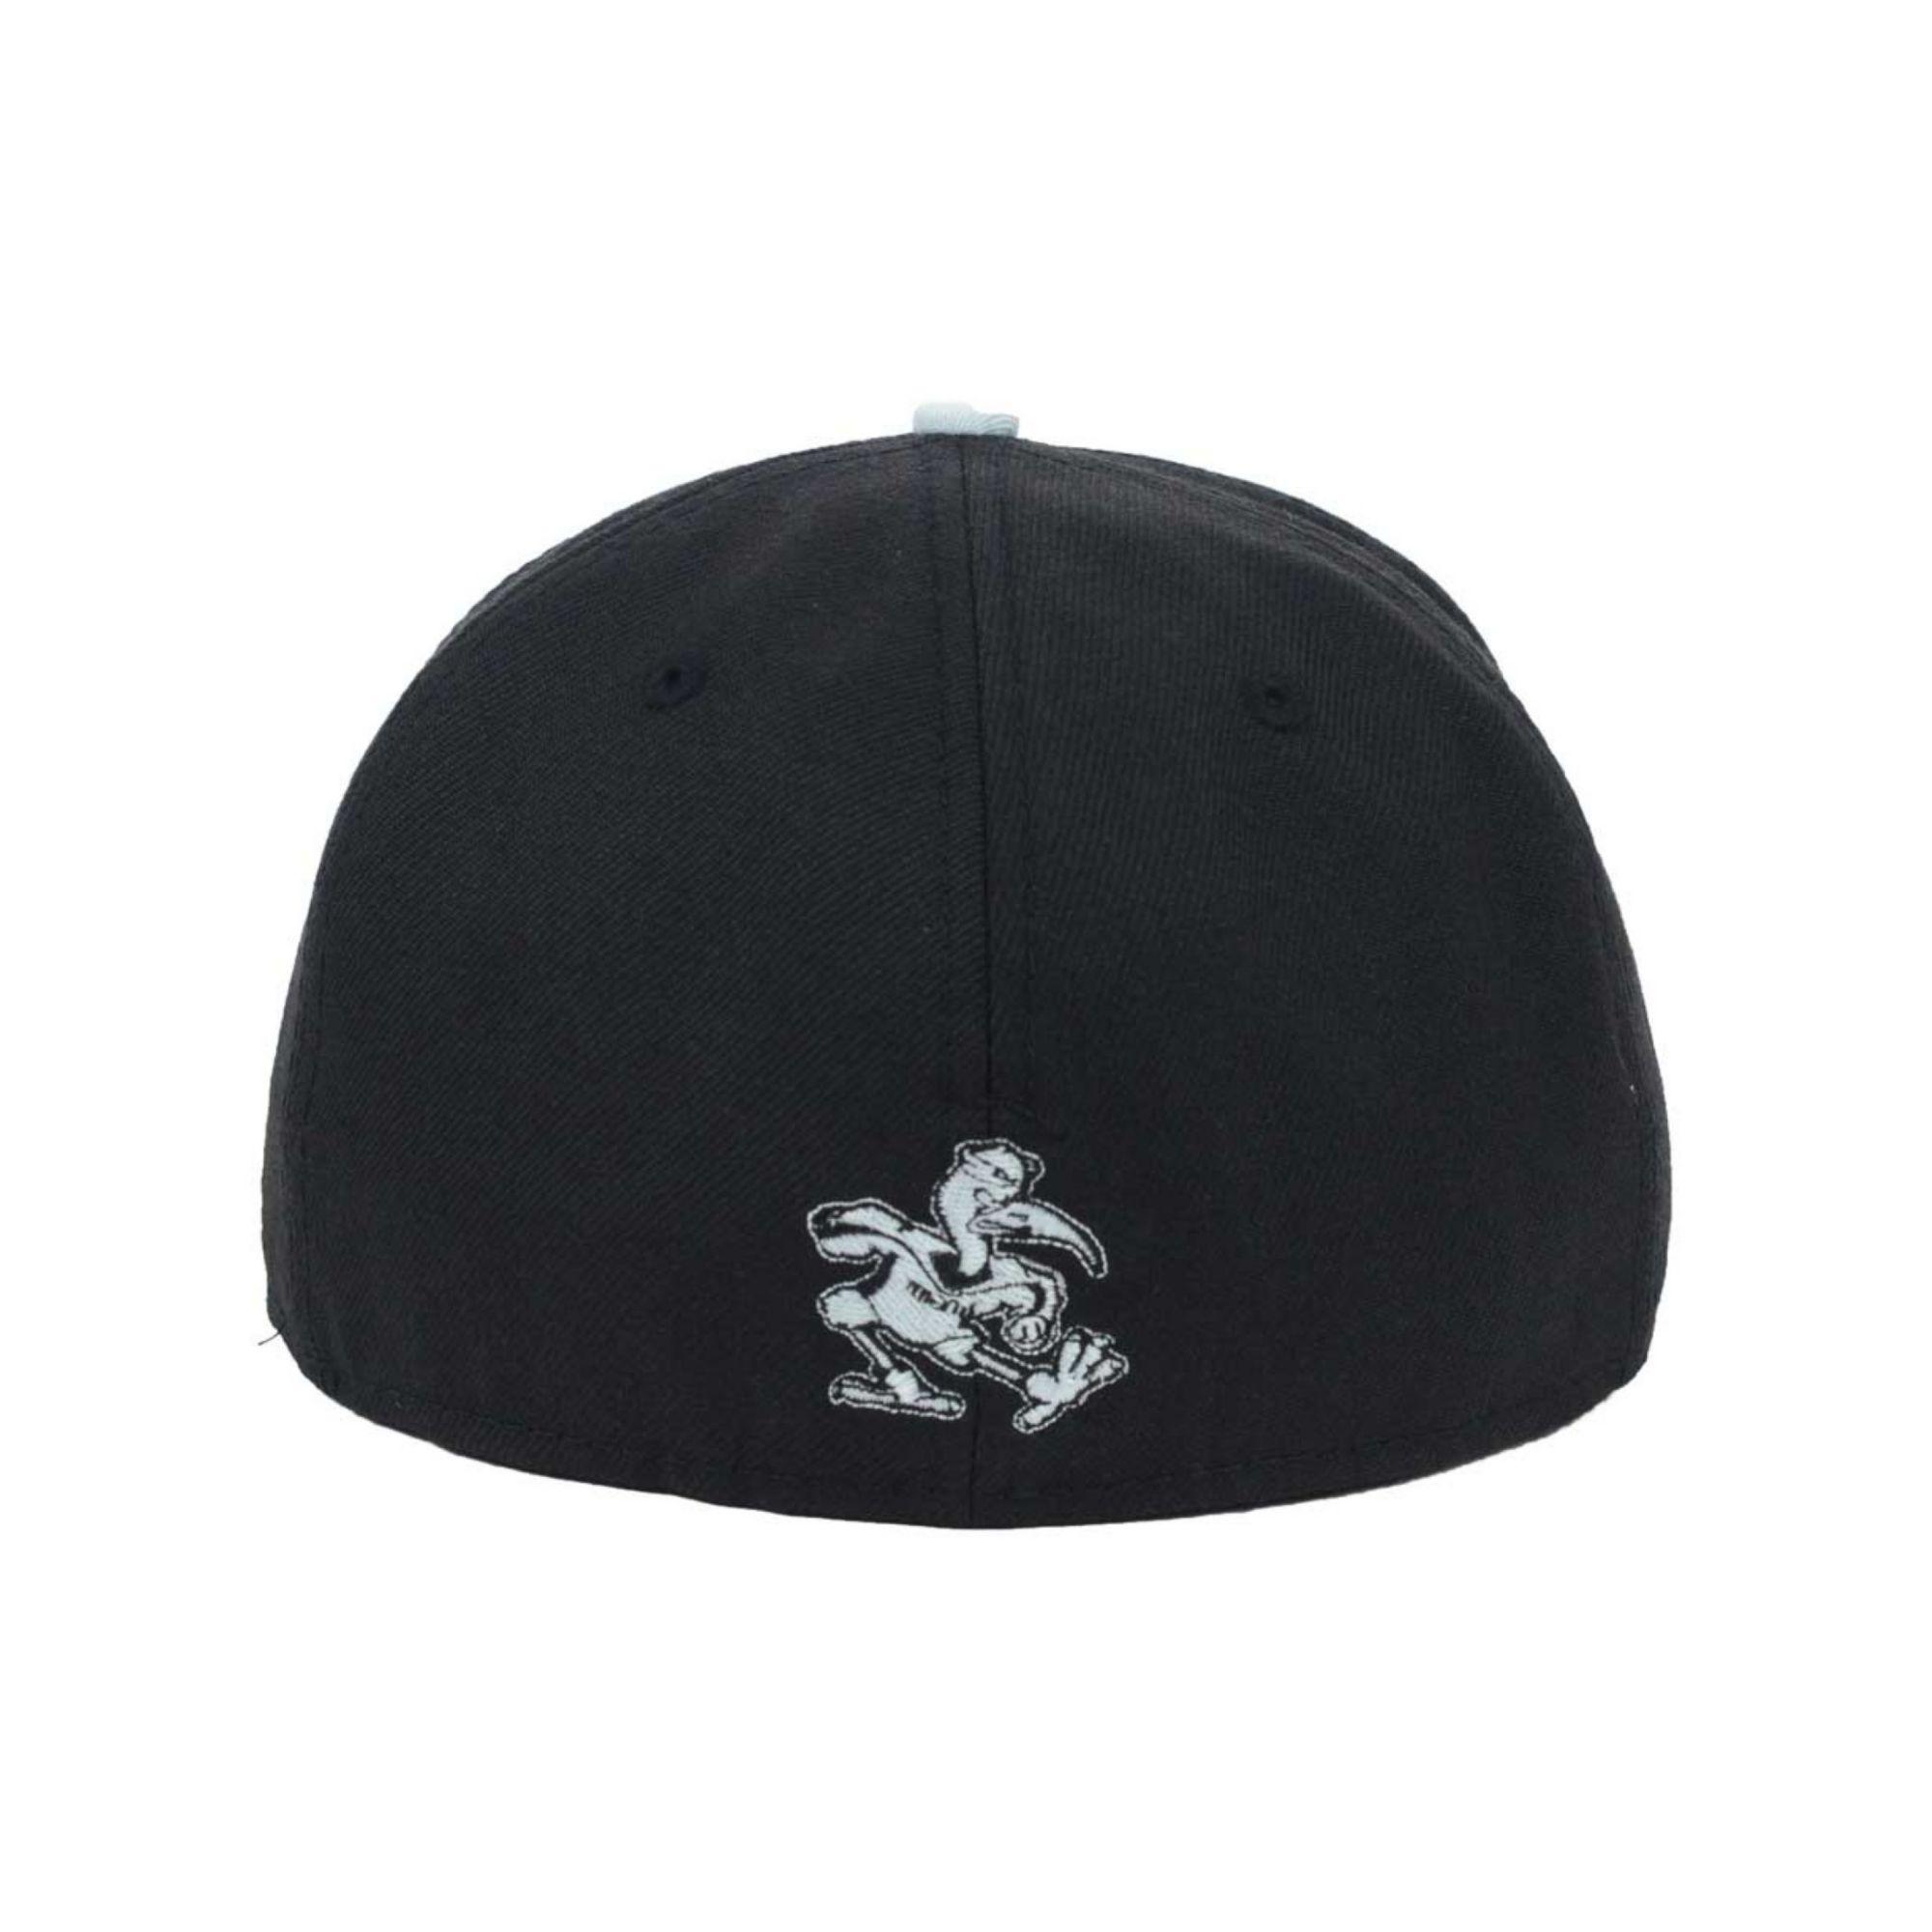 b9d1335c879 ... cheapest lyst ktz miami hurricanes urban camo 59fifty cap in black for  men 51c96 19982